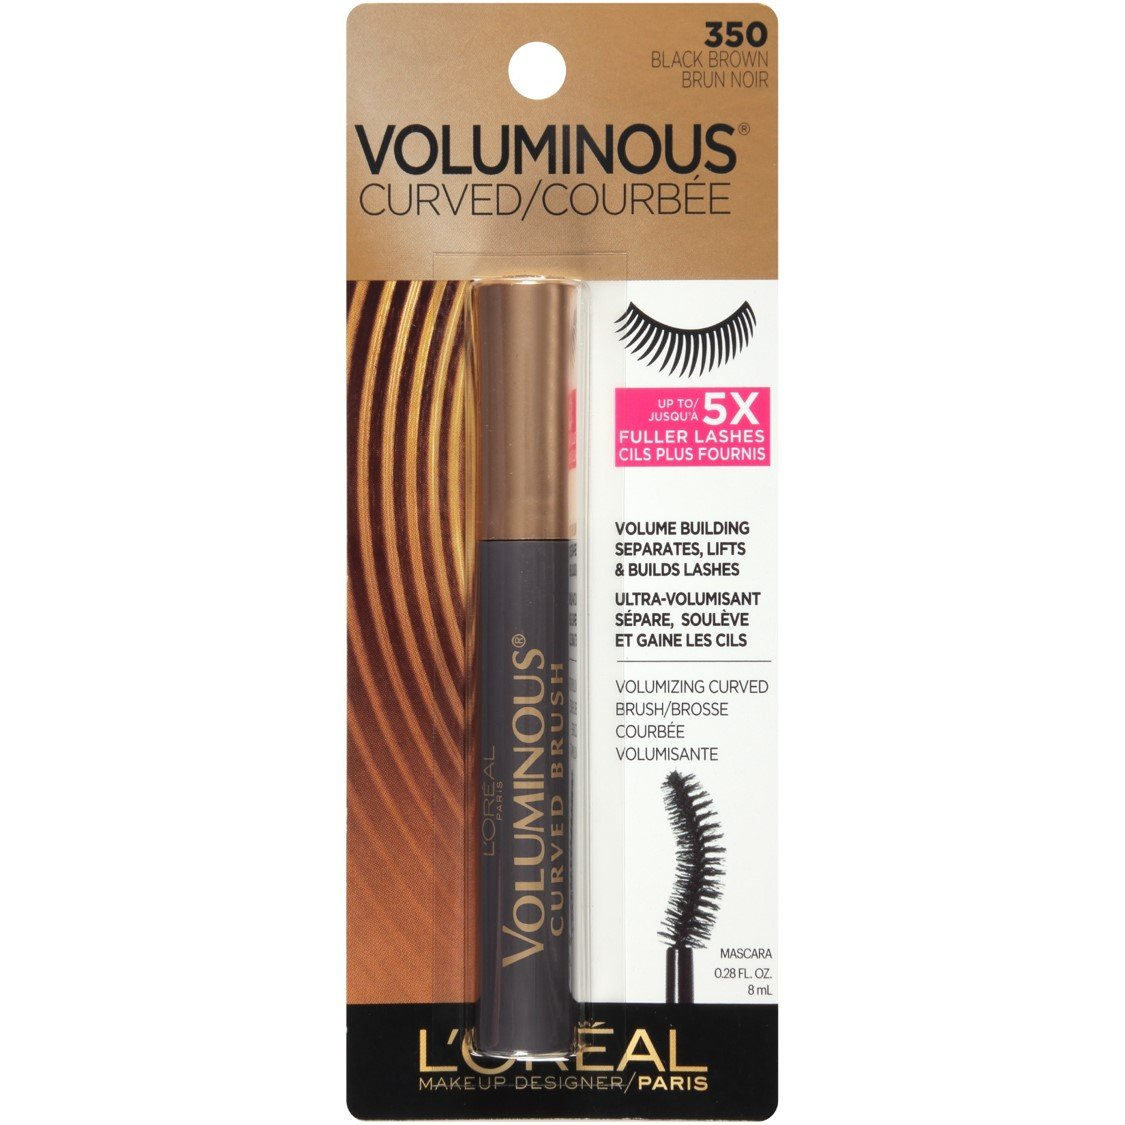 d9029fe50a5 Amazon.com: L'Oreal Paris Makeup Voluminous Original Volume Building Curved  Brush Mascara, Black, 0.28 fl. oz.: Beauty